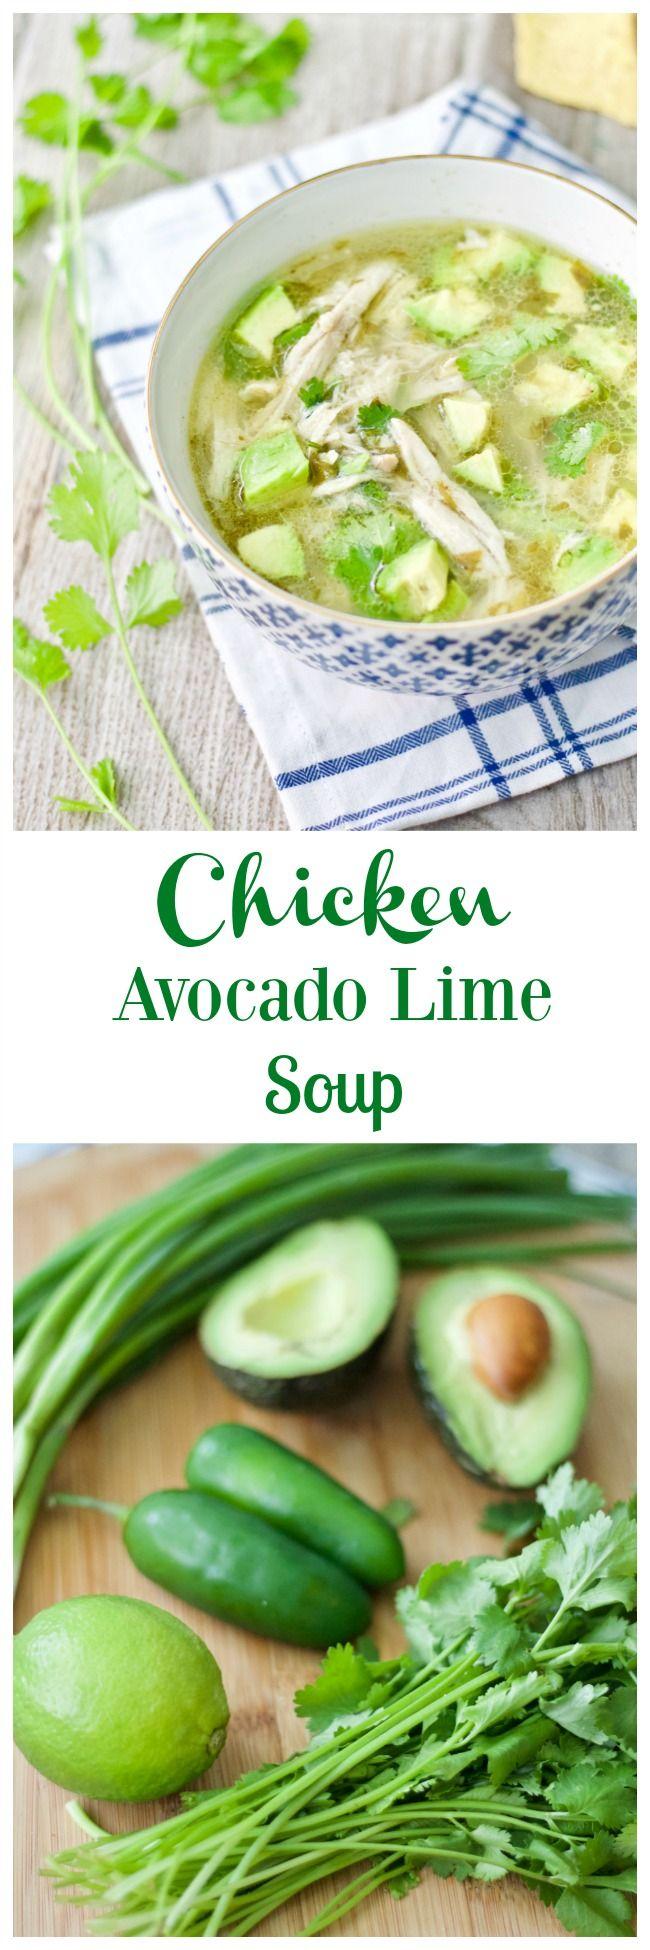 Chicken Avocado Lime Soup.  Gluten Free. Dairy Free. Soy Free. Keto Soup.